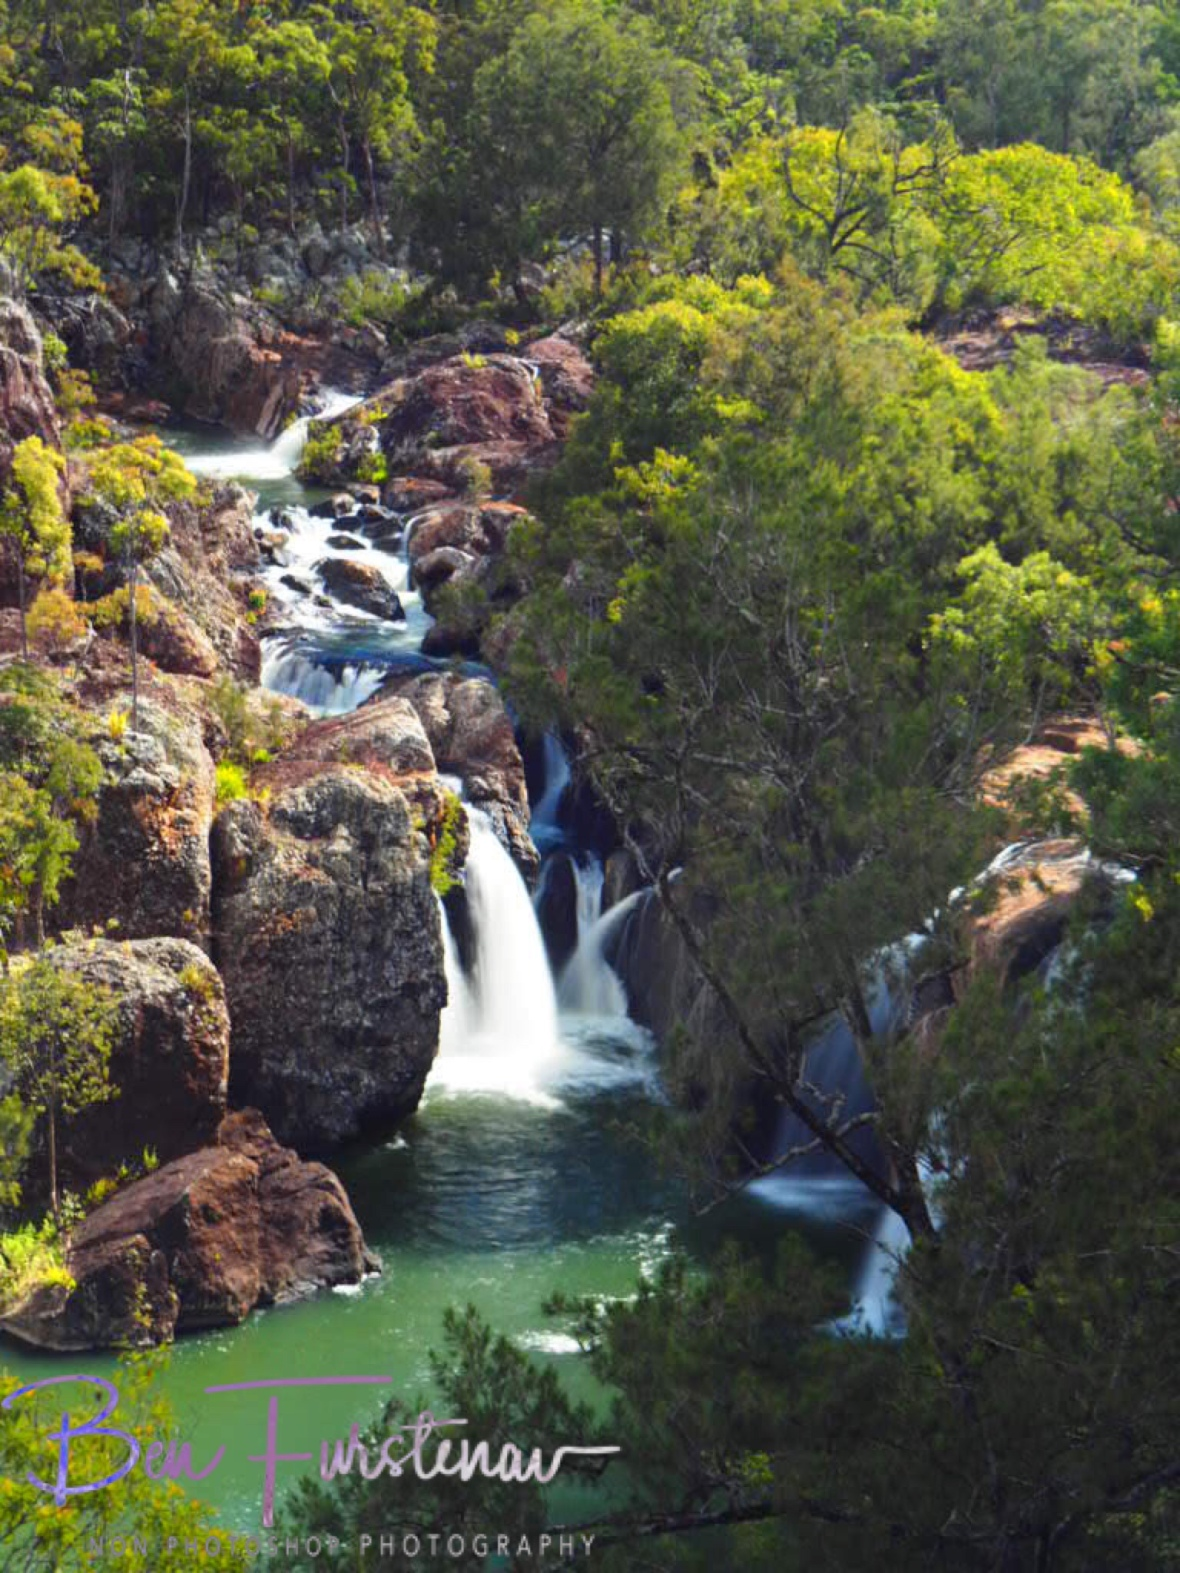 Creek diversions, Atherton Tablelands, Far North Queensland, Australia